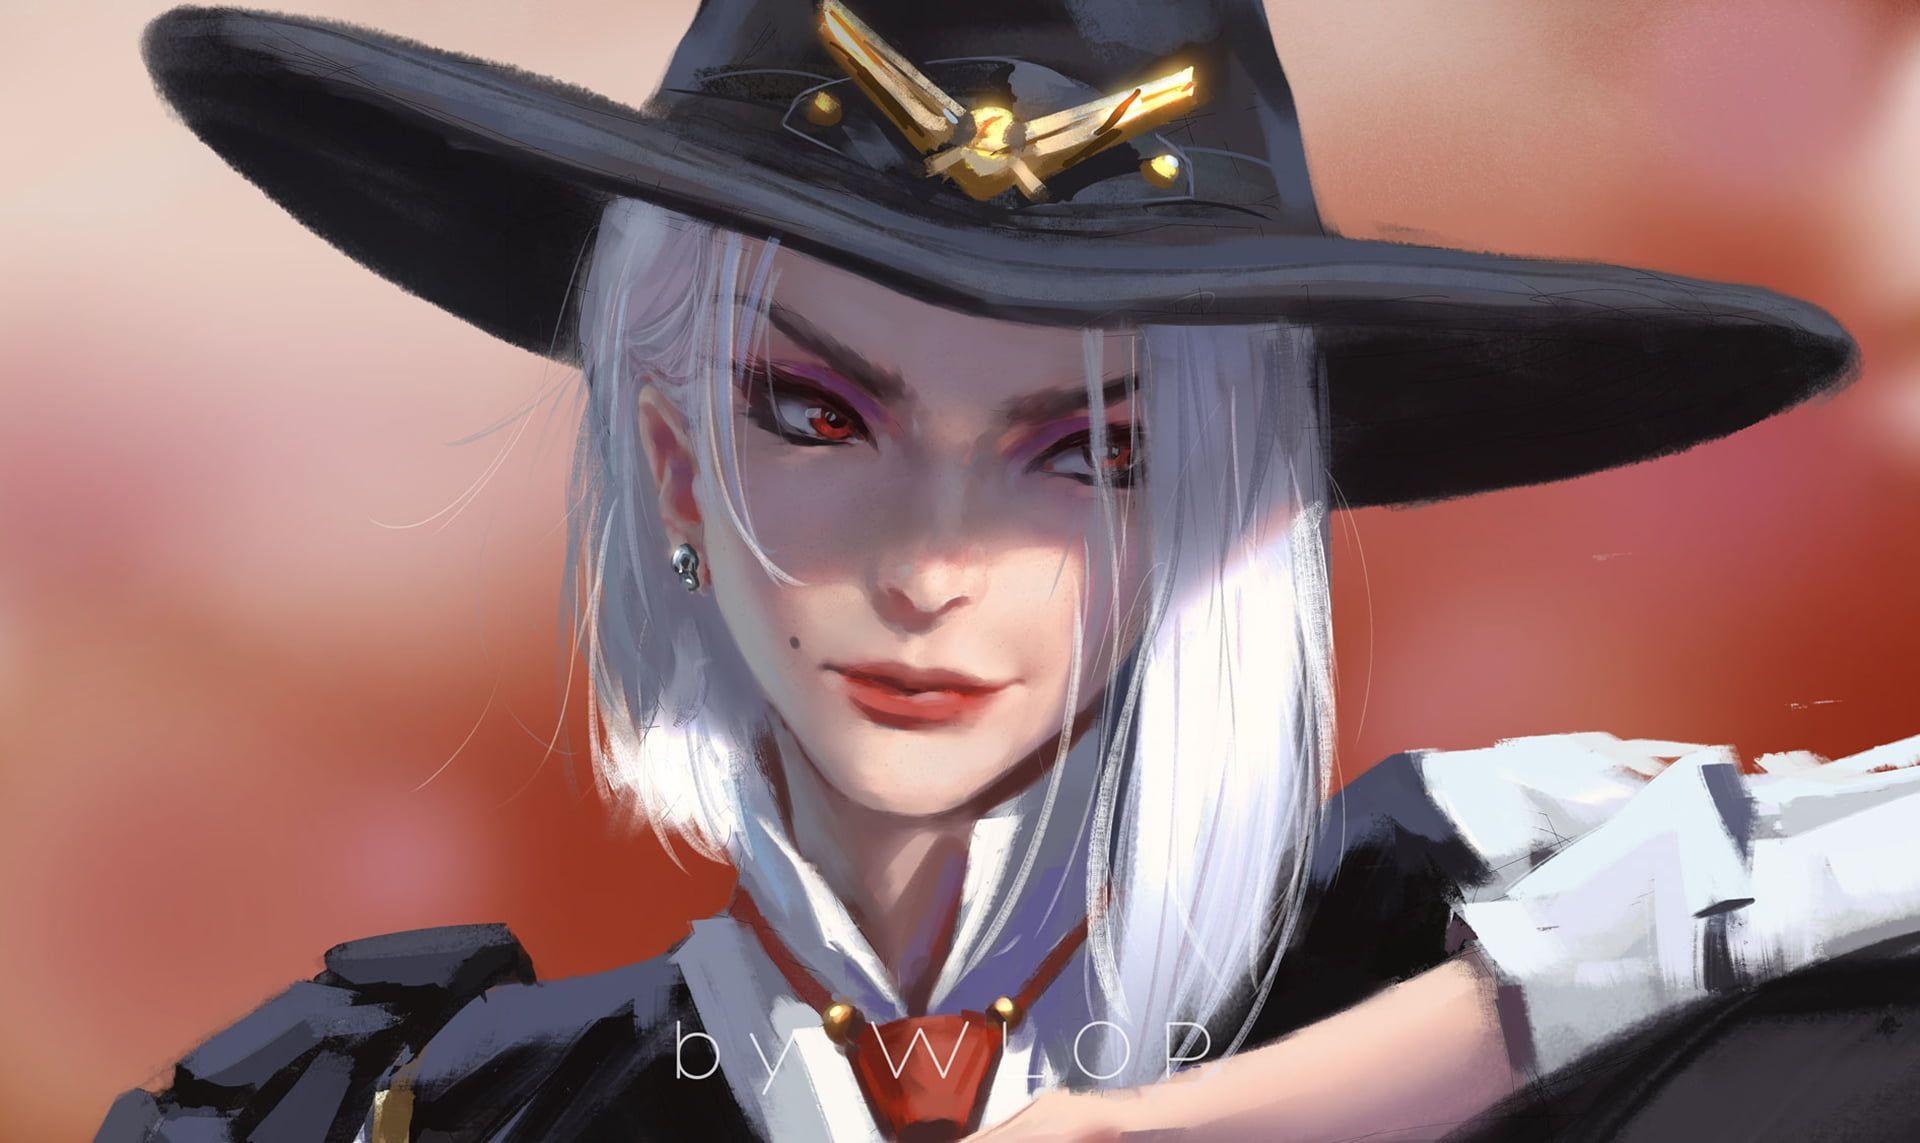 Ashe (Overwatch) white hair red eyes Overwatch artwork